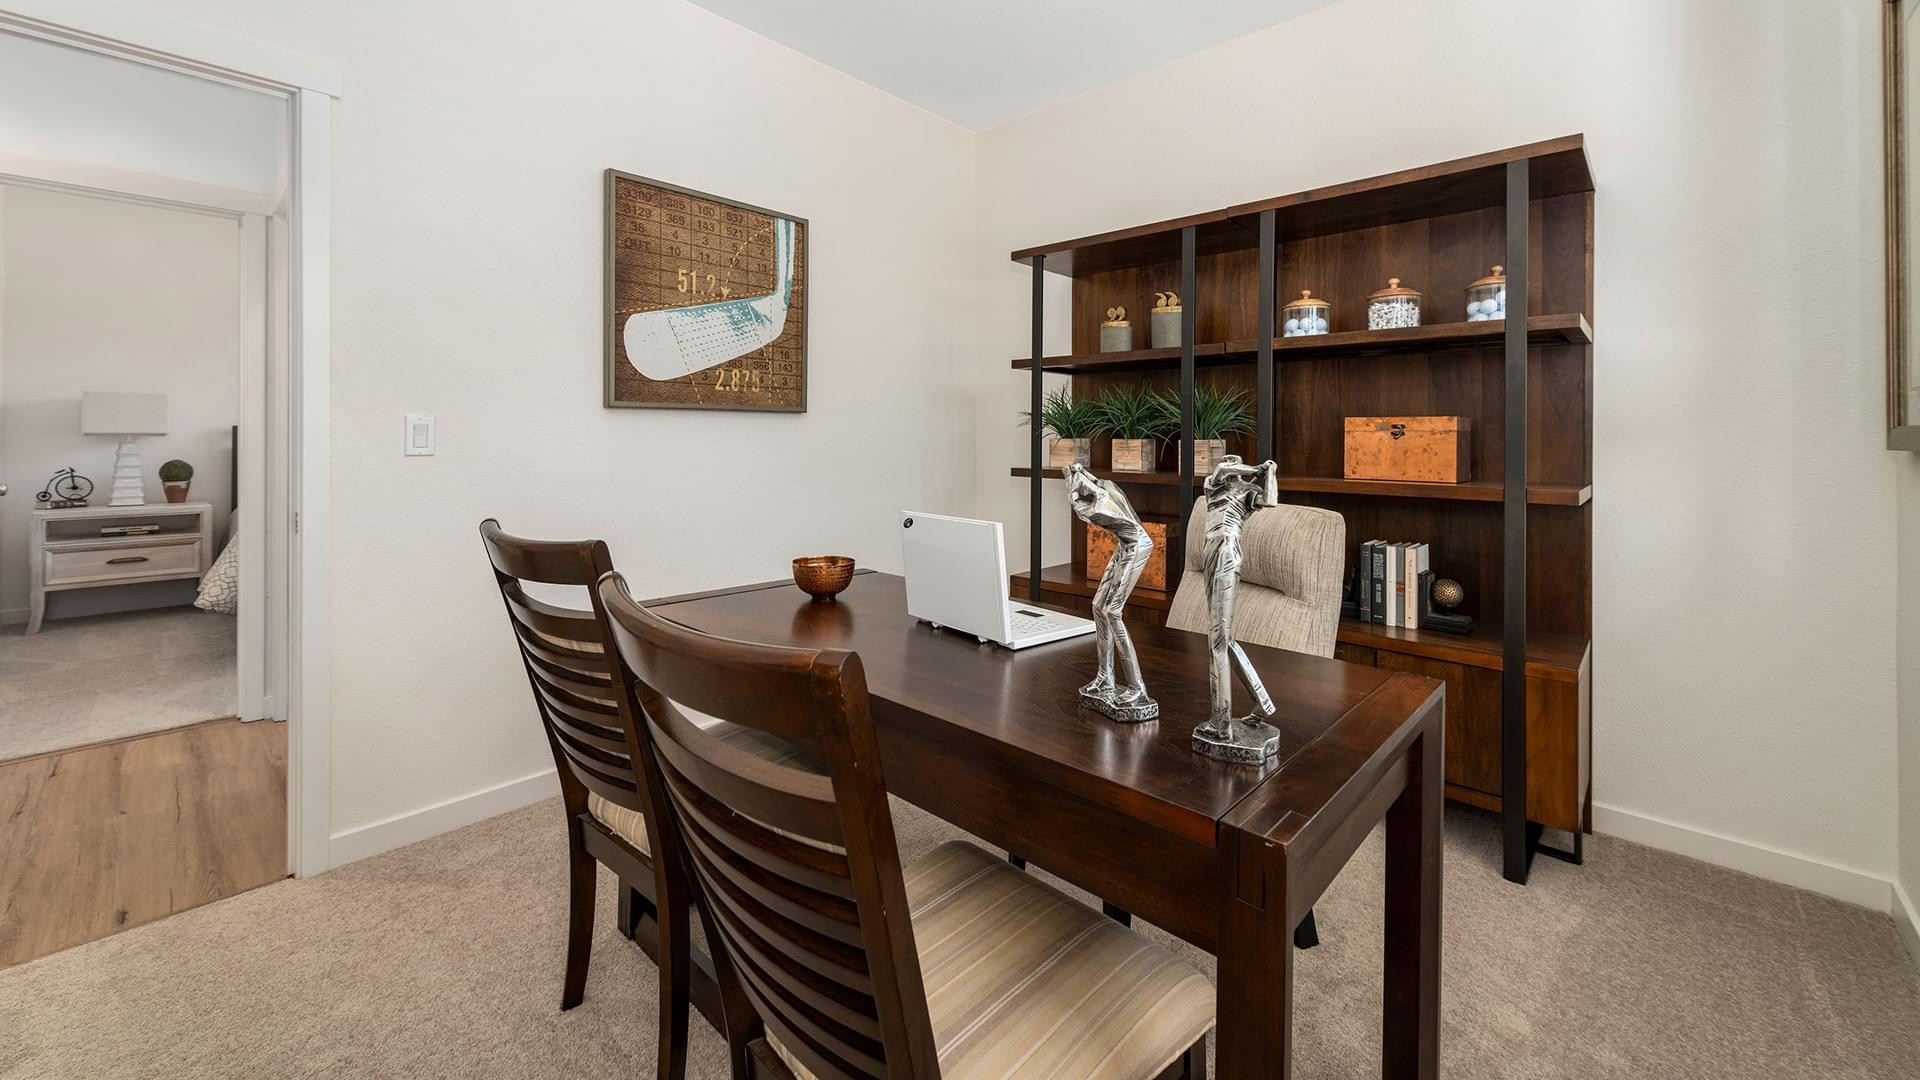 Residence 1 | Lot 166 | Bedroom 3